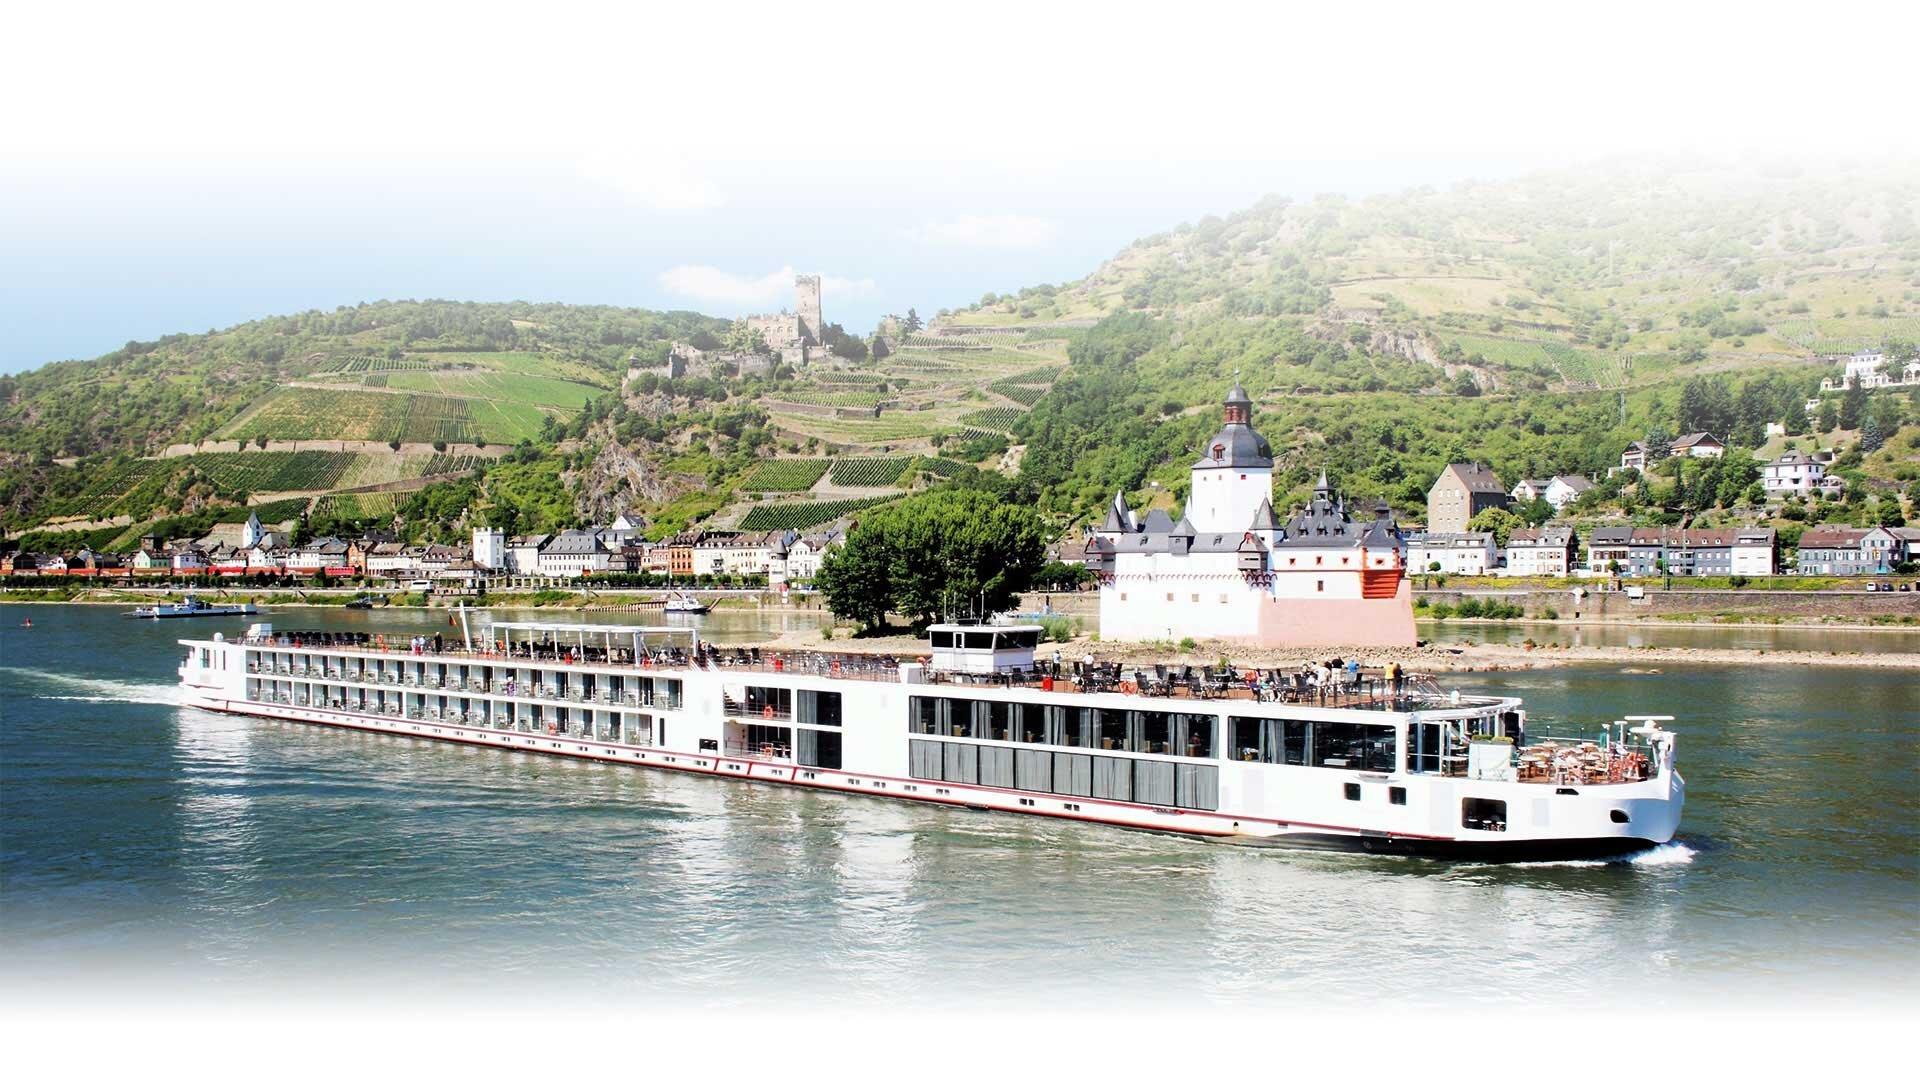 river cruise ship warewashing equipment